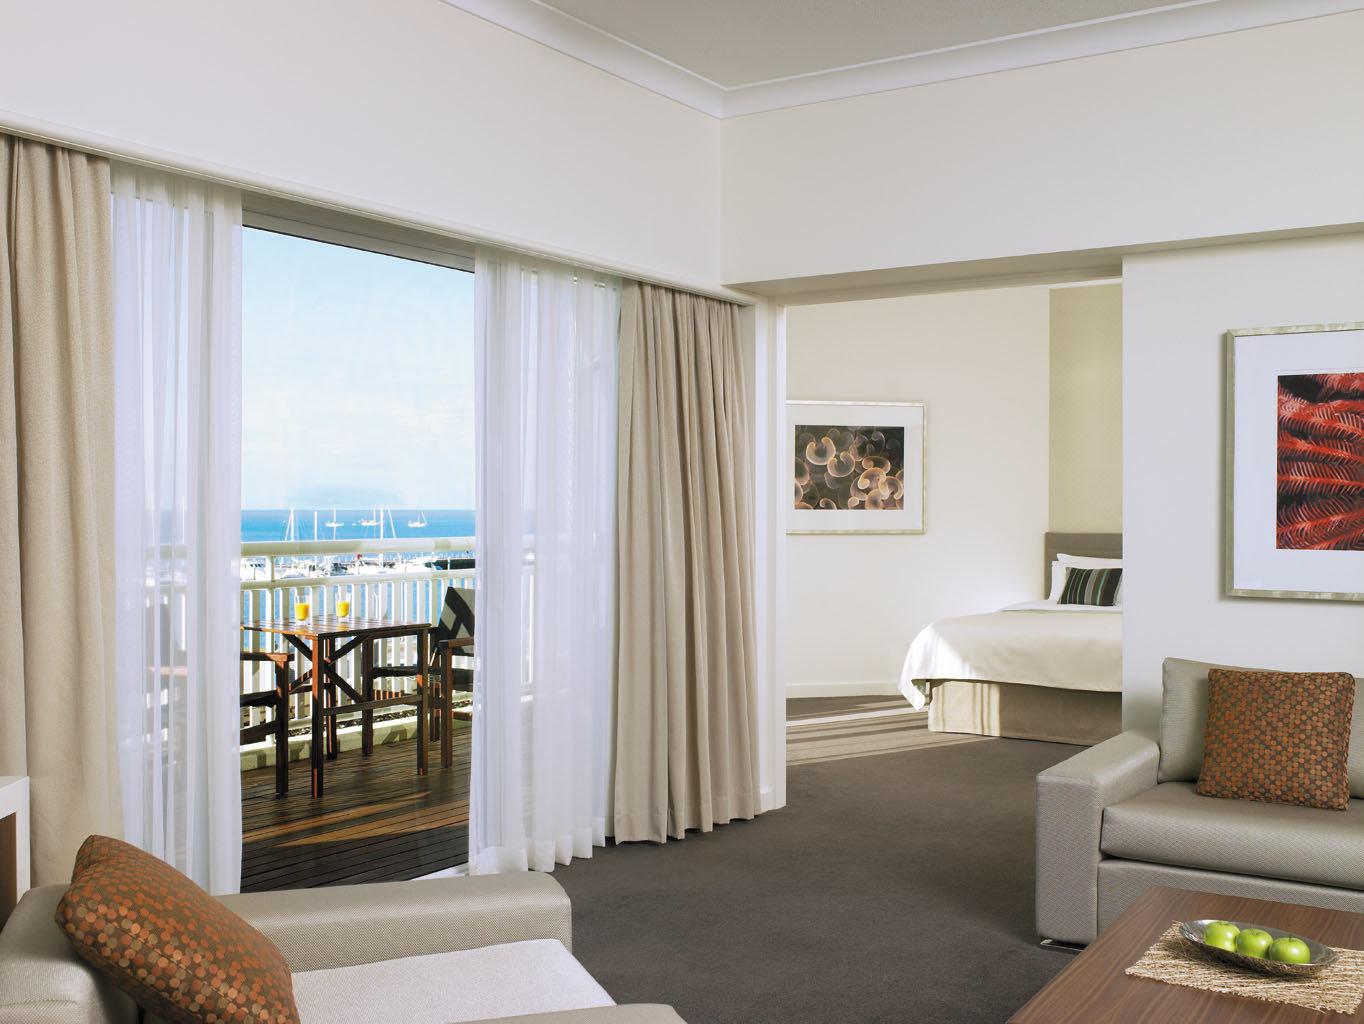 Balcony Classic Luxury Scenic views Suite Waterfront sofa living room property home condominium curtain window treatment Bedroom flat